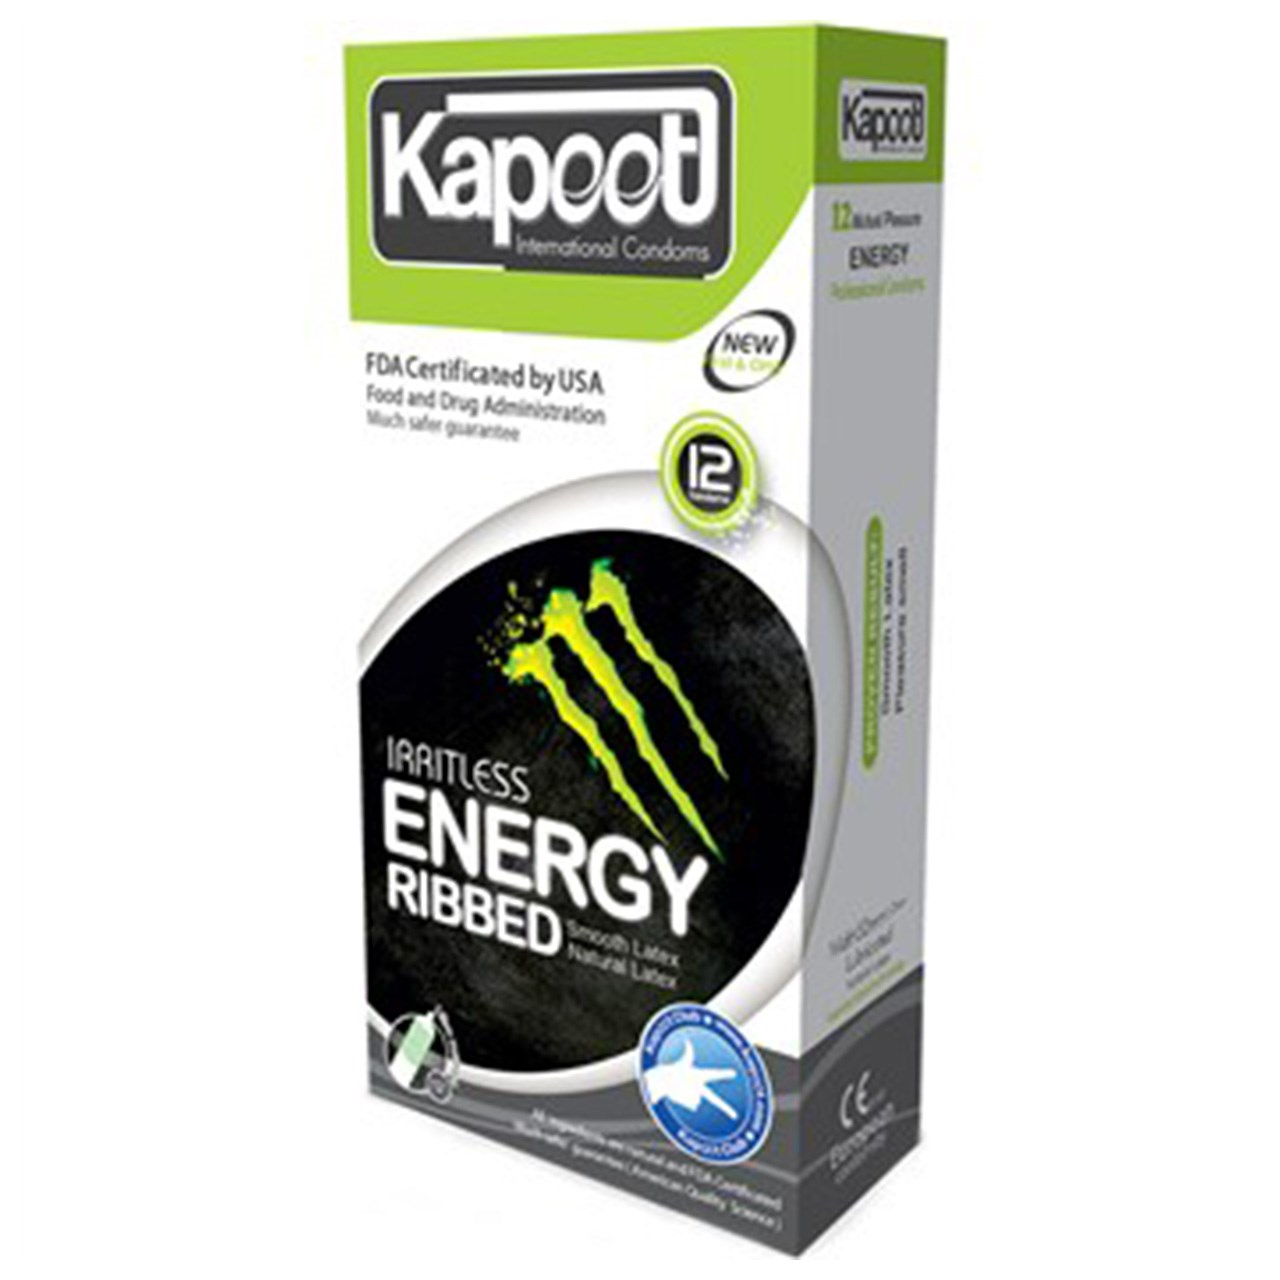 قیمت کاندوم کاپوت مدل انرژی زا energy and ribbed بسته 12 عددی